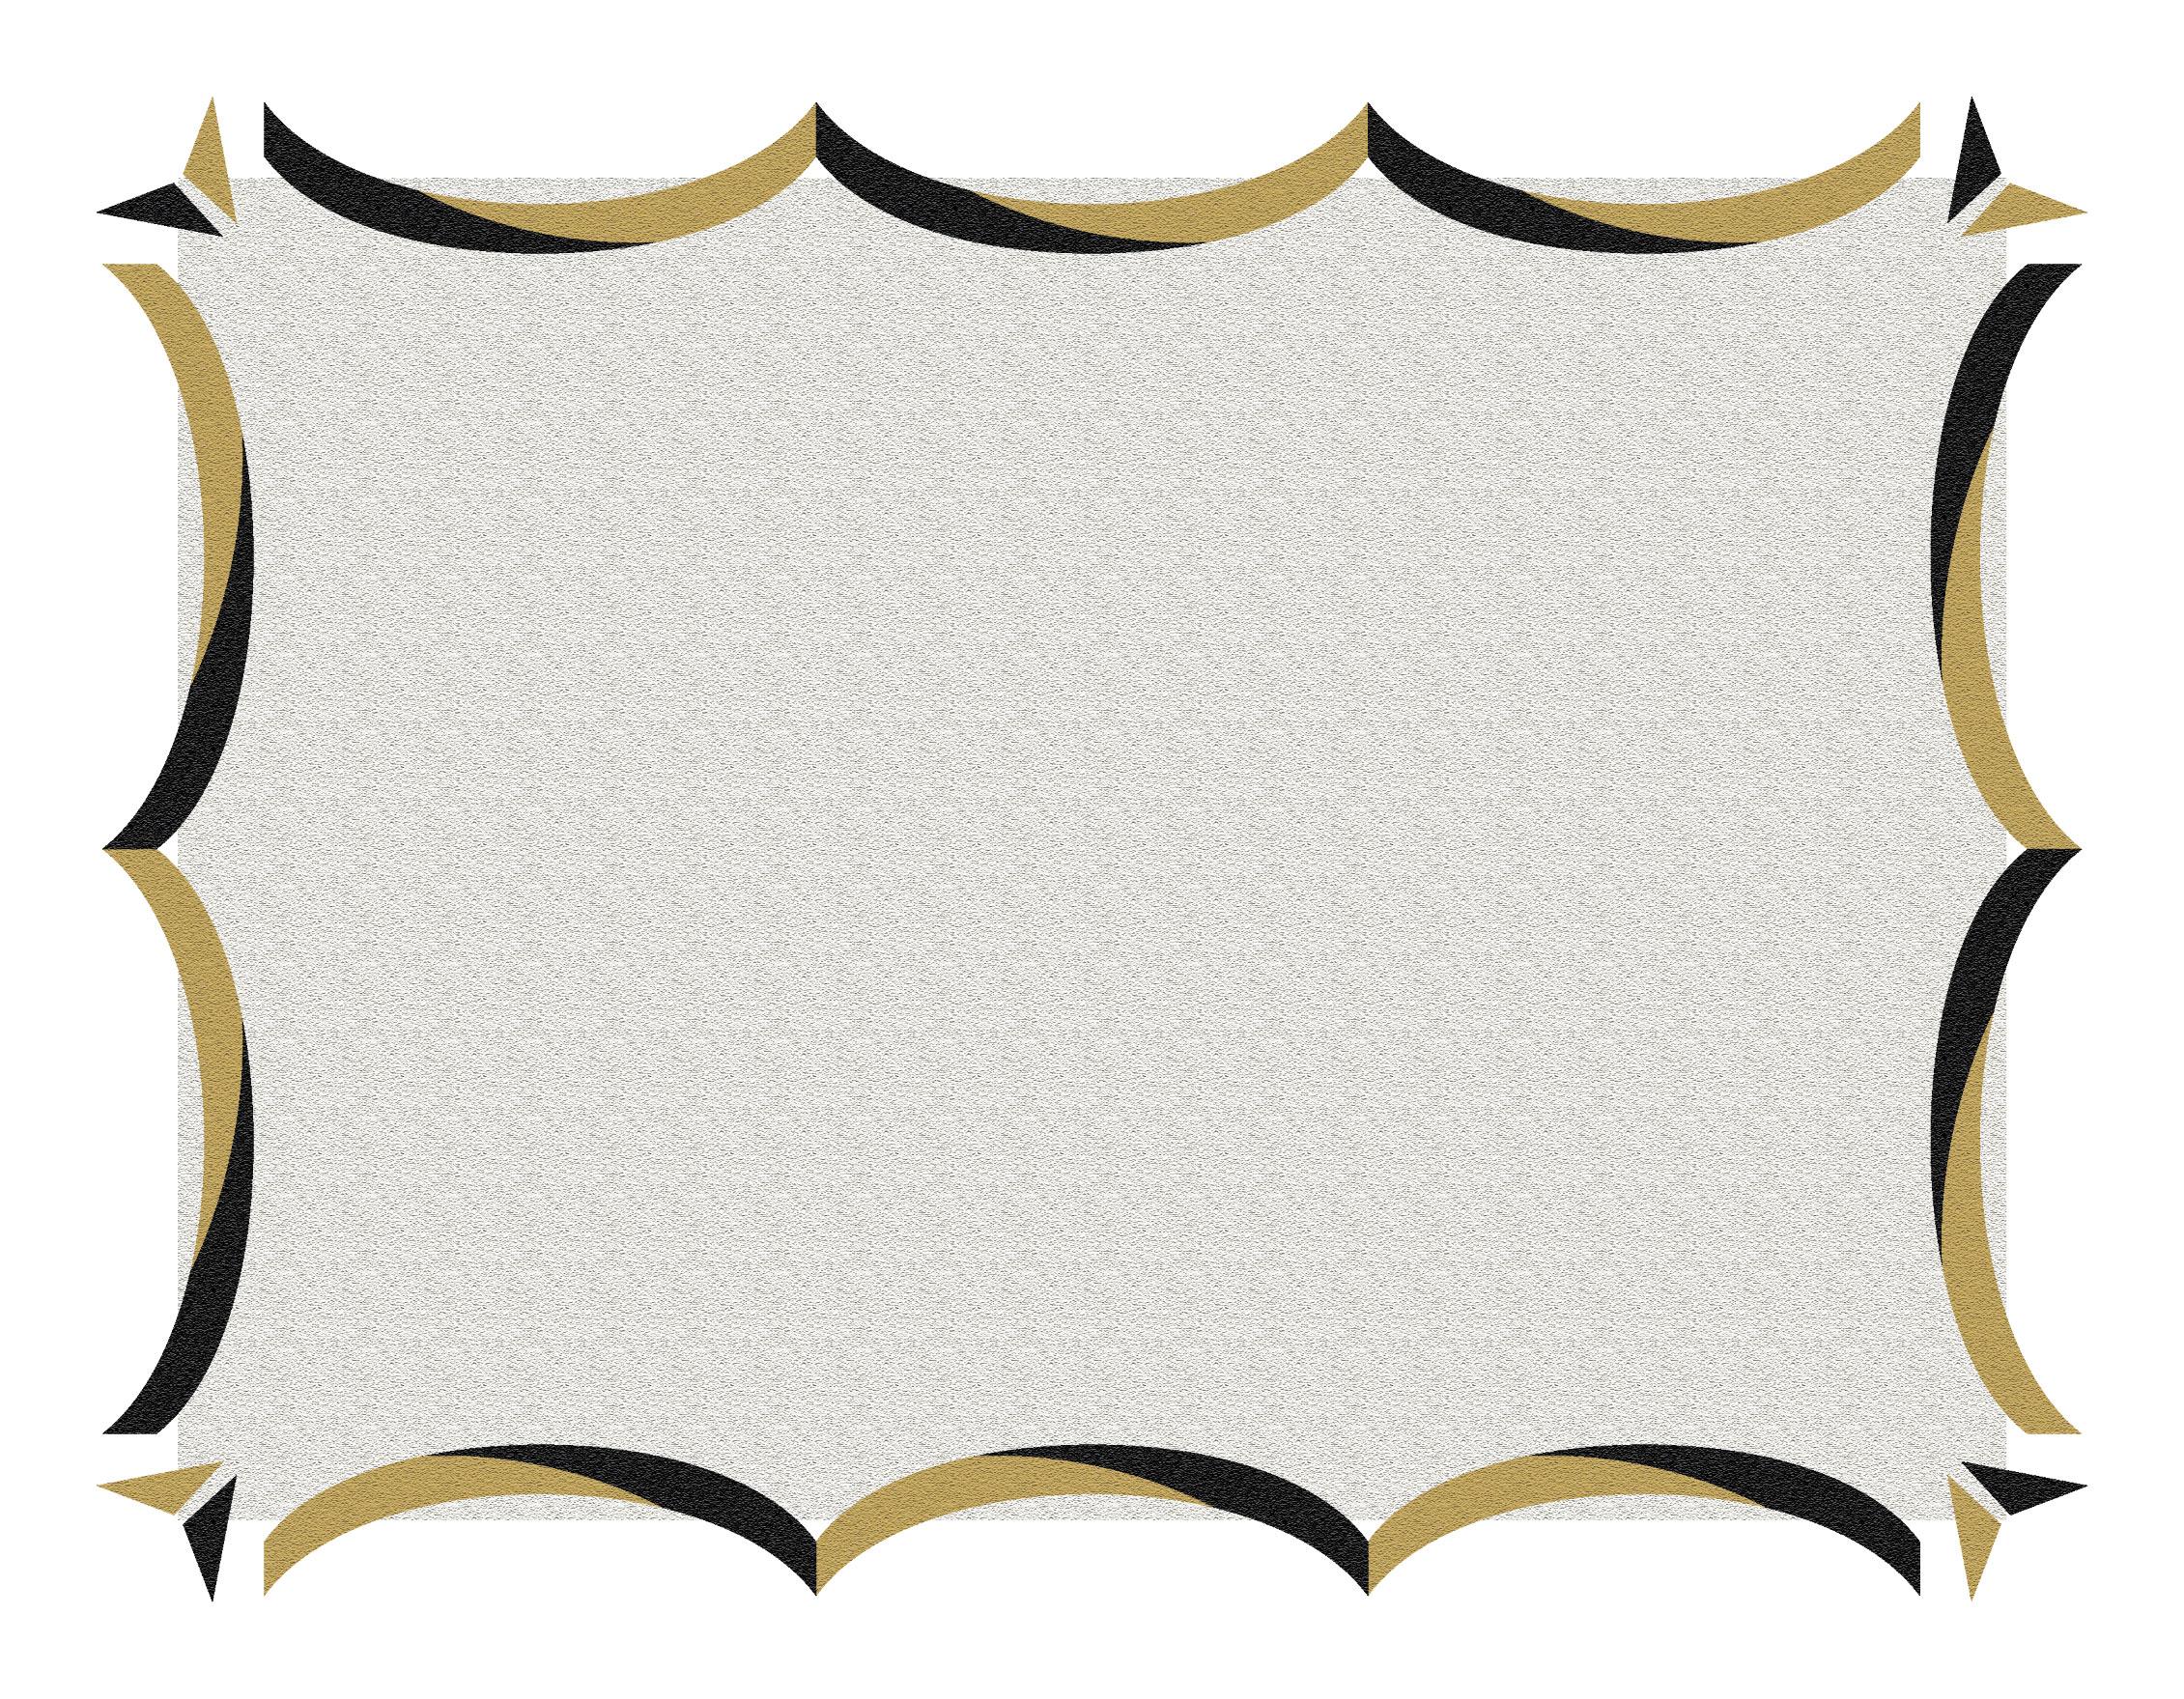 2261x1759 Pink Scroll Border Clip Art